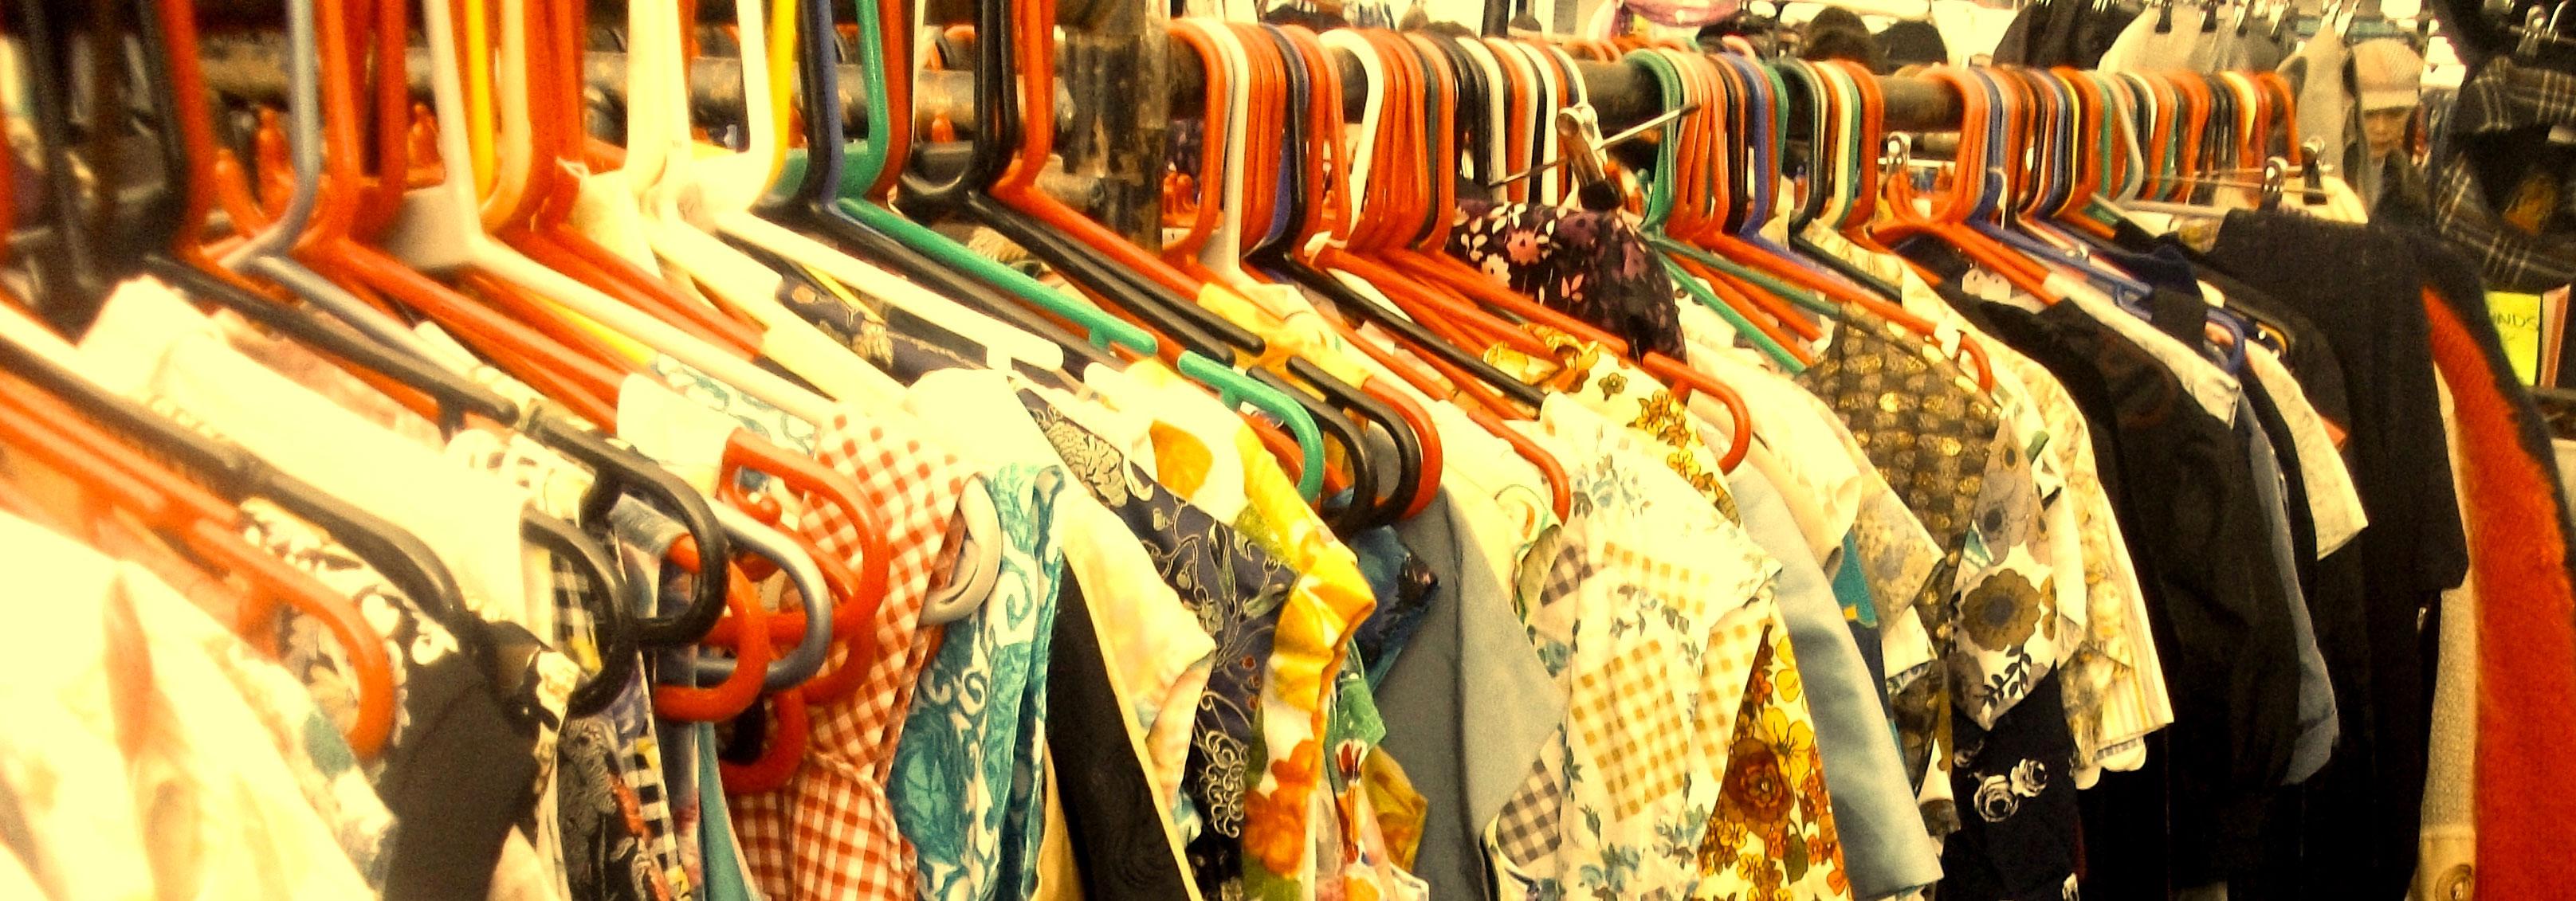 Treviglio Vintage Market